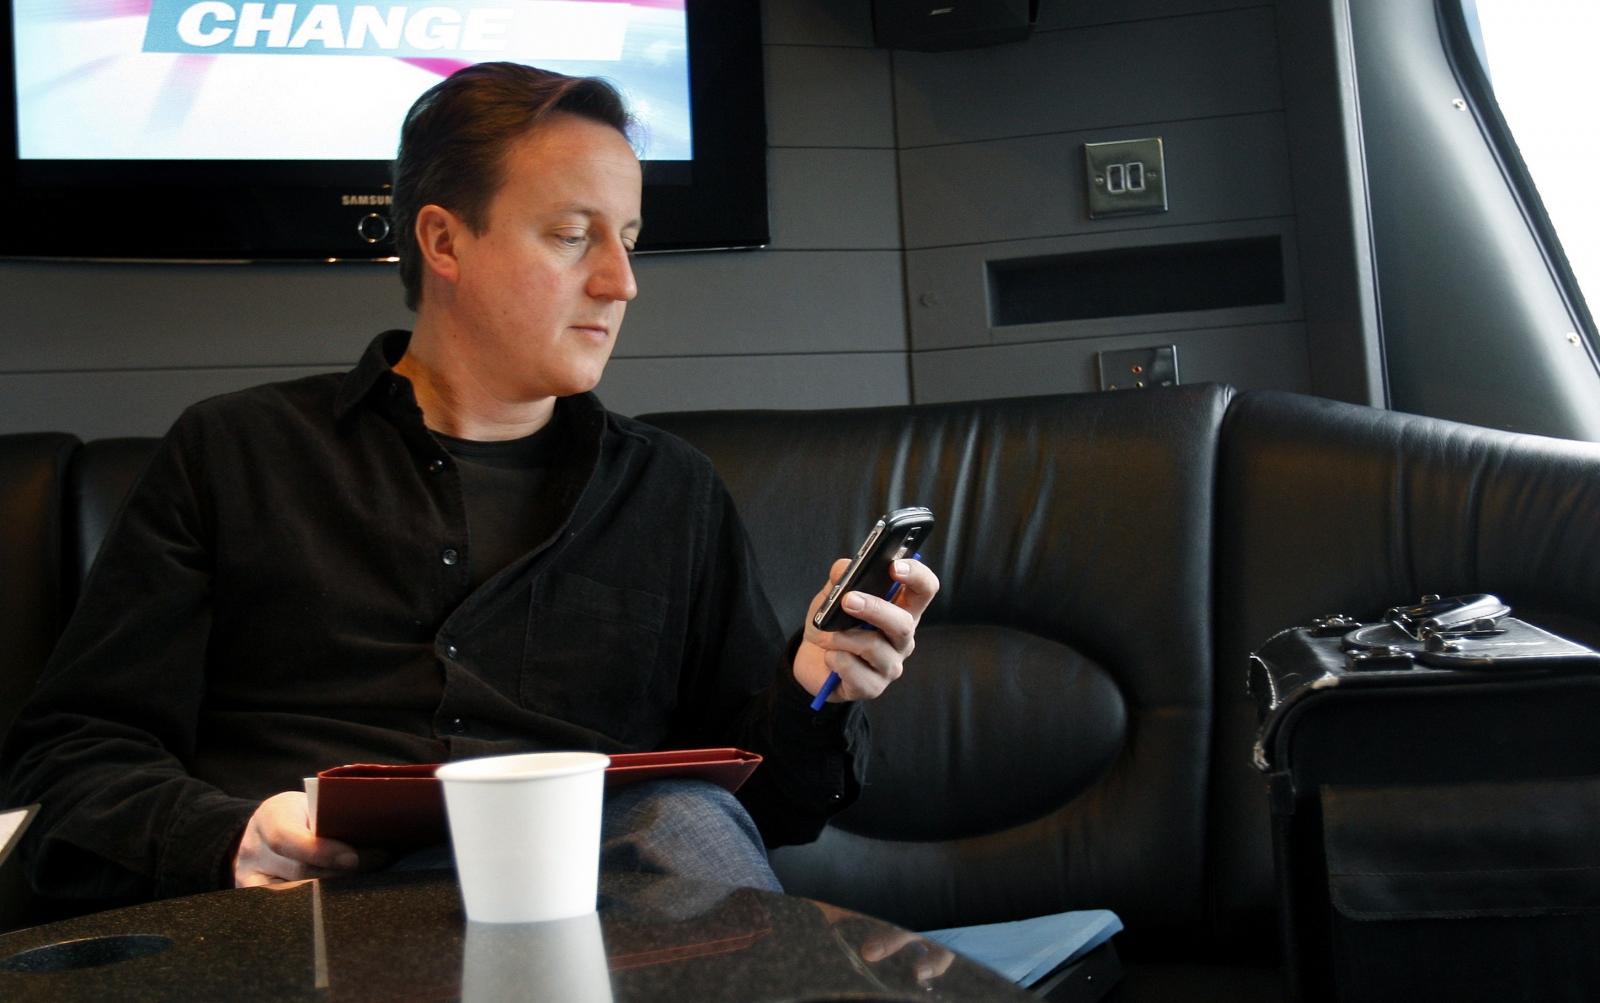 David Cameron and mobile phone